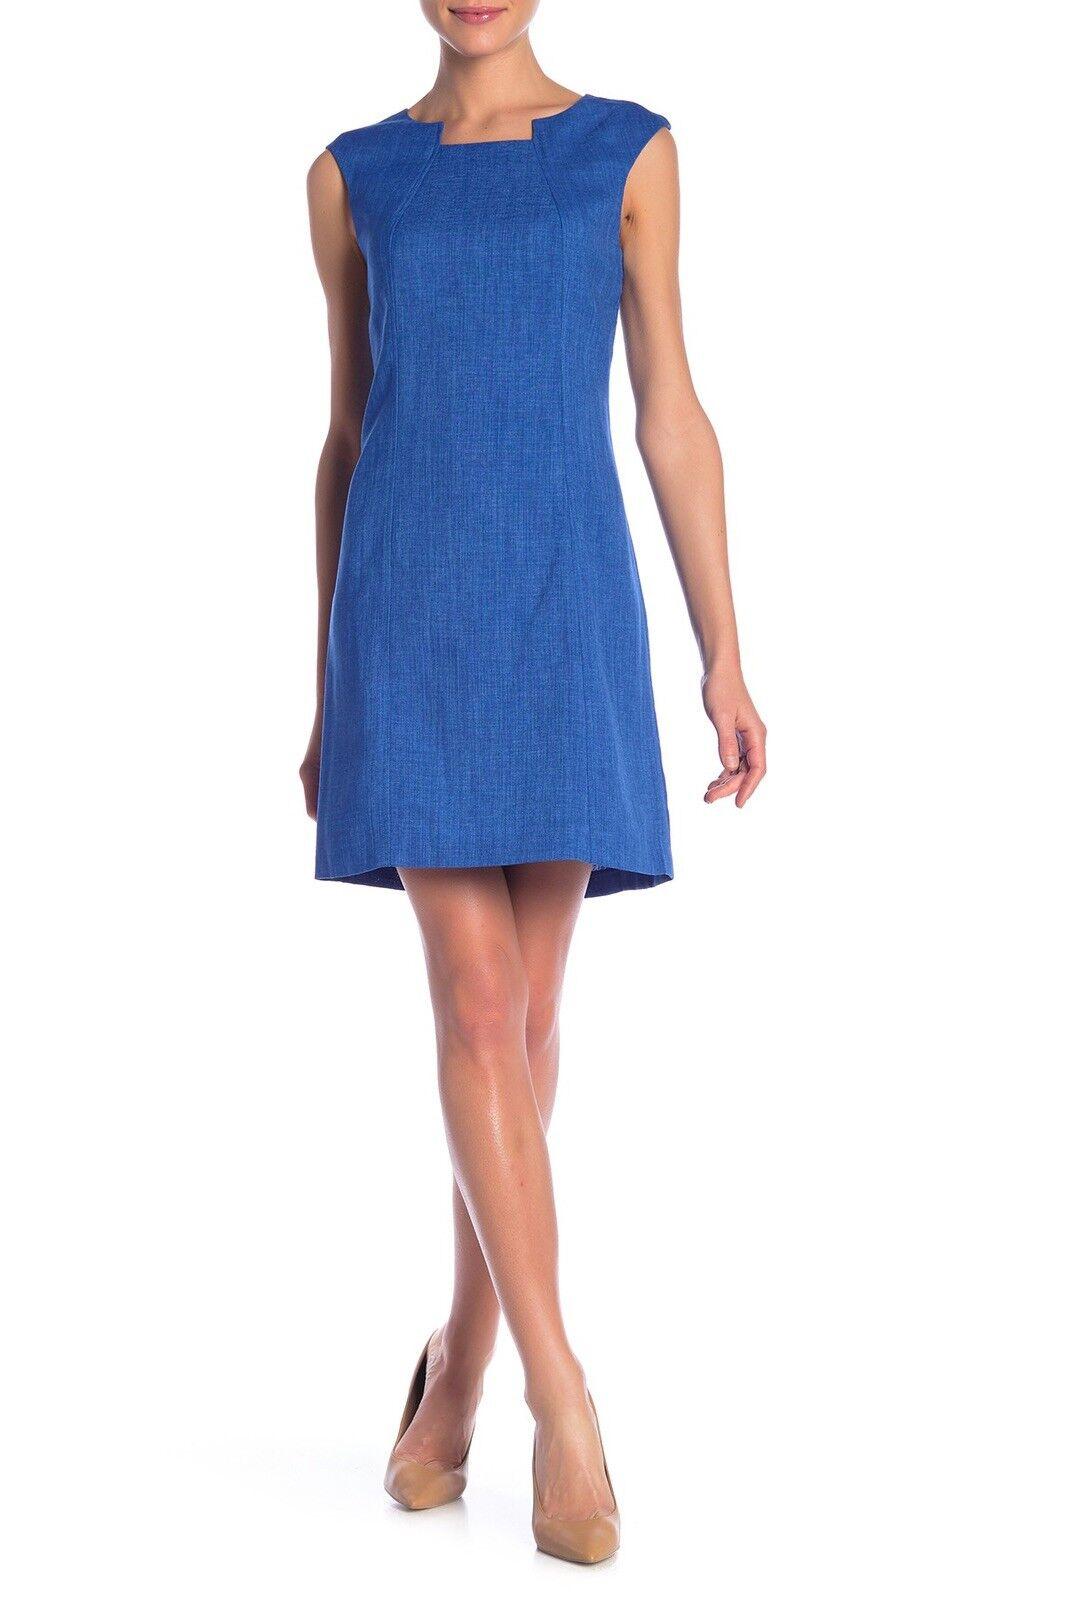 NWT Tahari Grasscloth Pintuck Neck Cap Sleeve Texturot Sheath Dress Blau